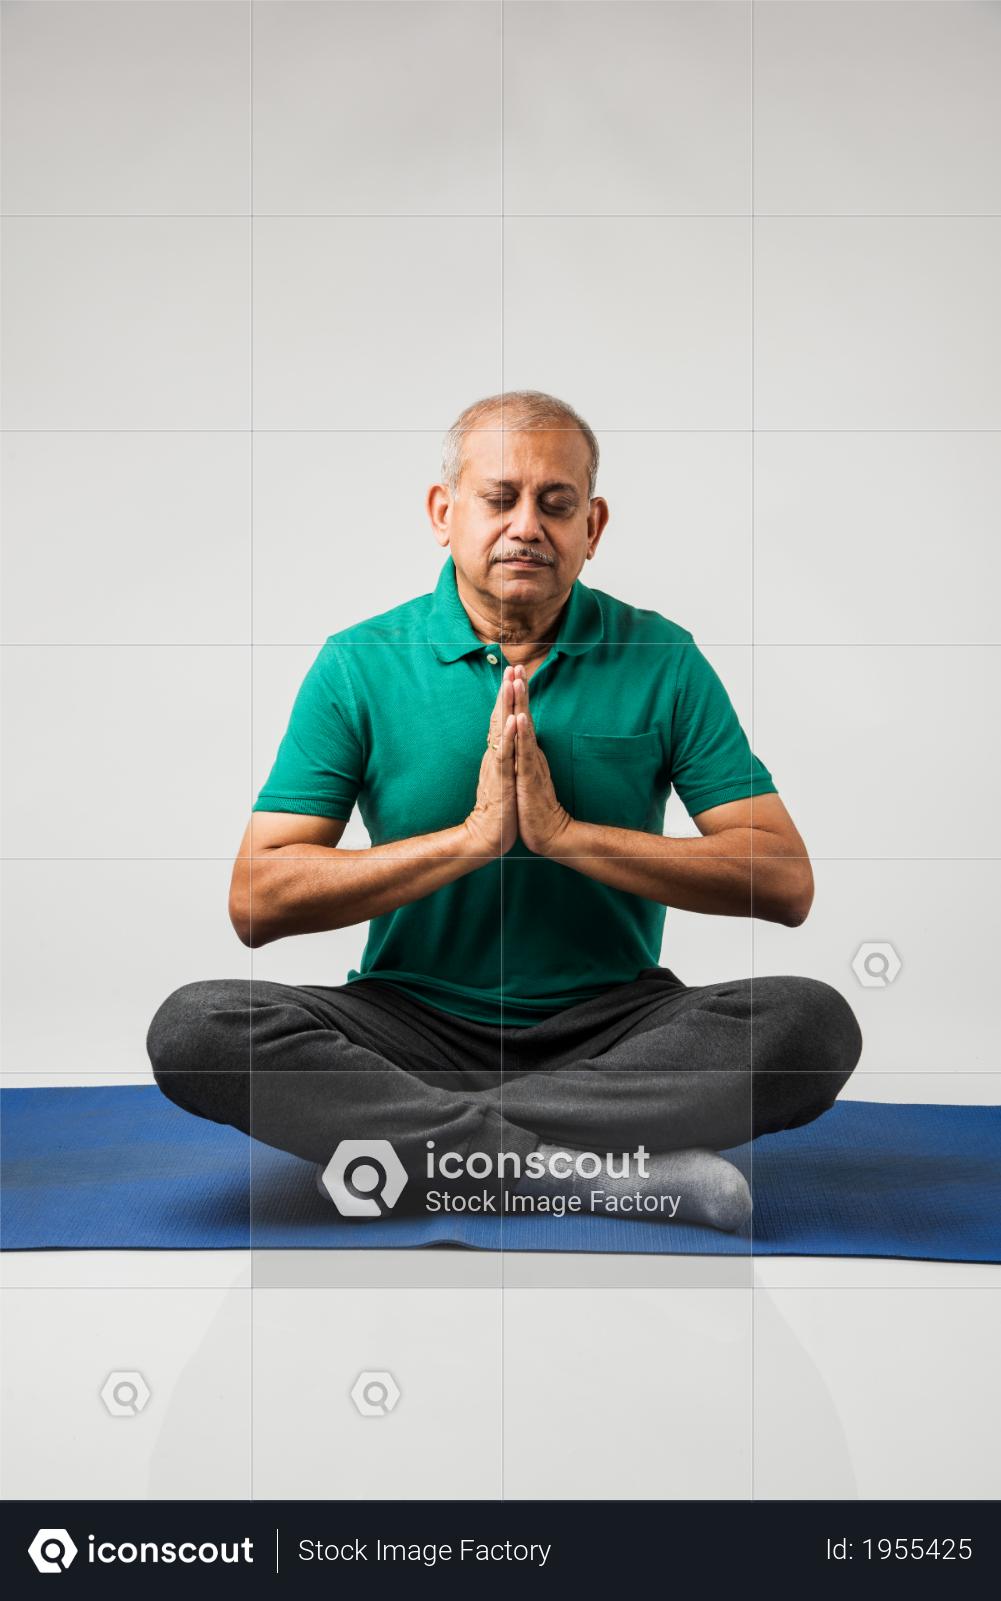 Premium Senior Indian Man Doing Yoga Or Meditation Photo Download In Png Jpg Format